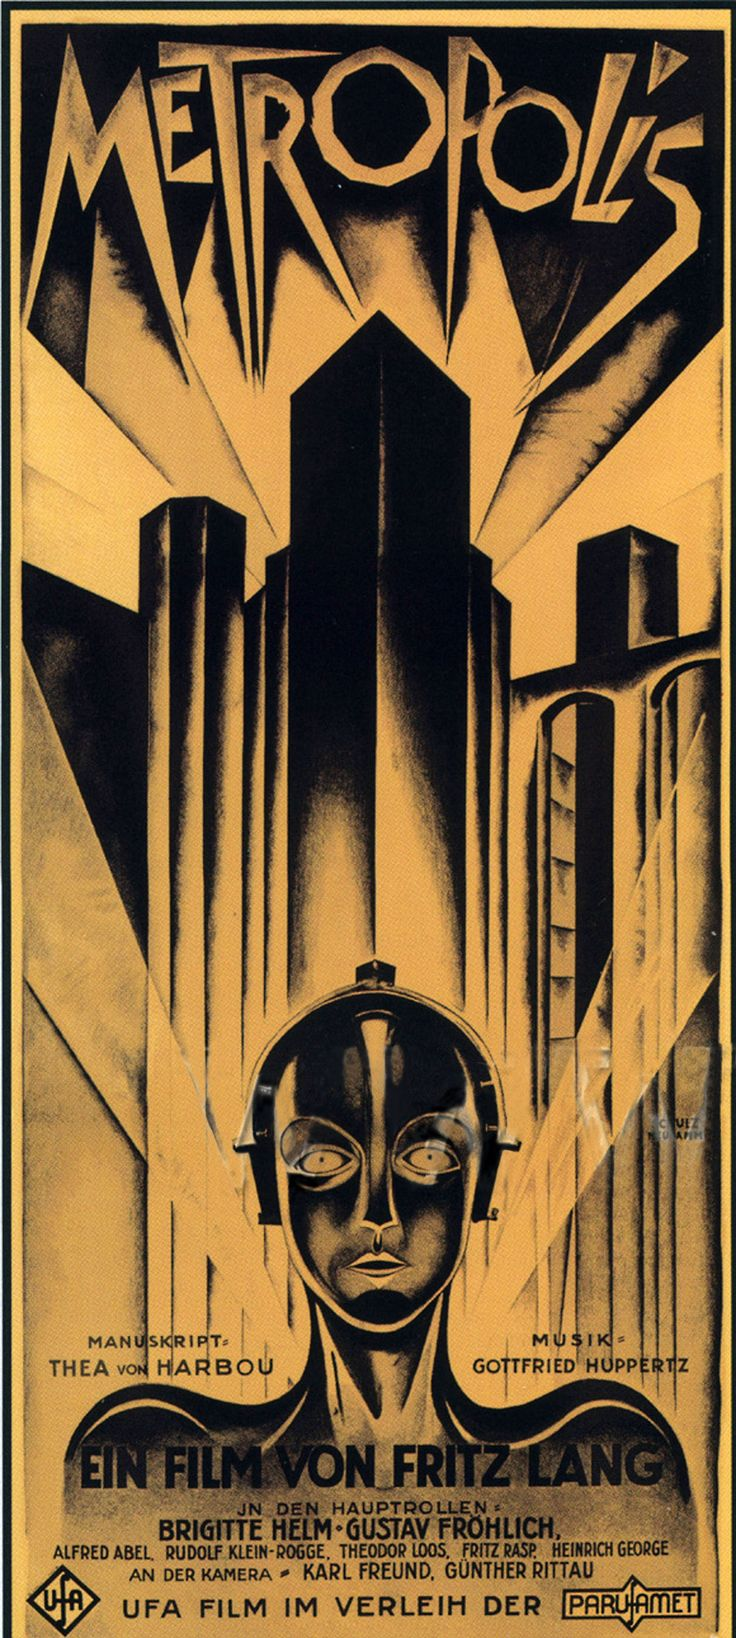 vintage art | Metropolis Poster, Metropolis (1927), Classic Vintage Movie Poster